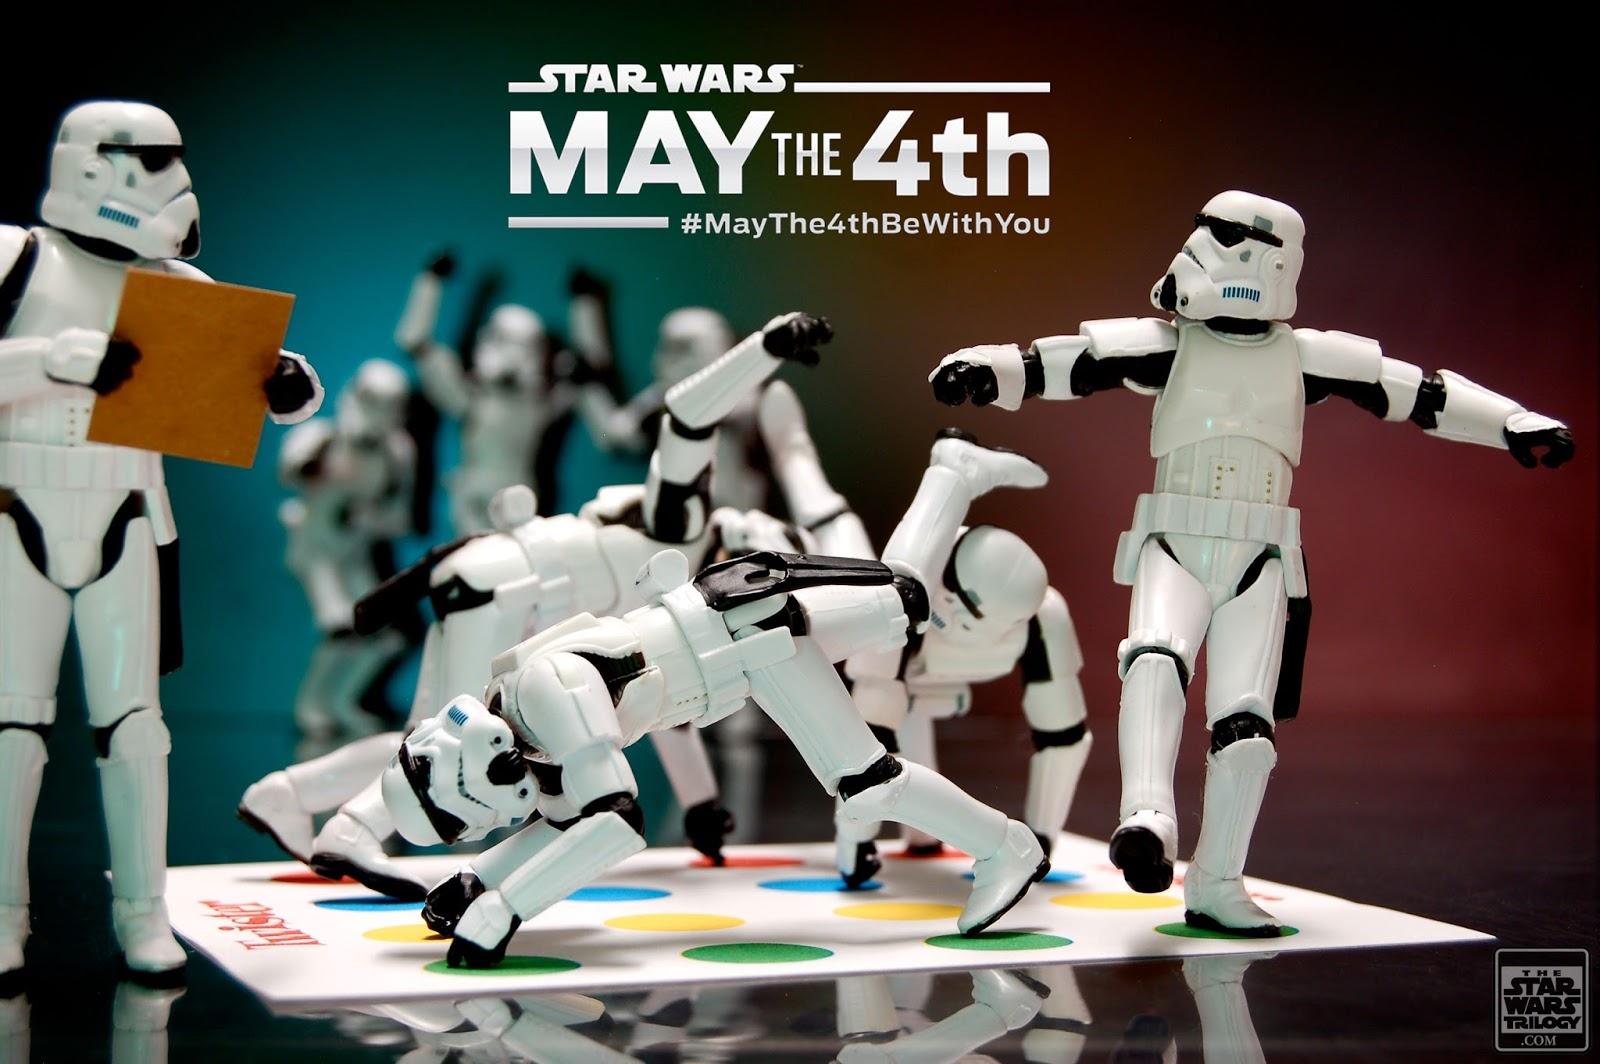 Star Wars Poster HD Wallpaper for Phones